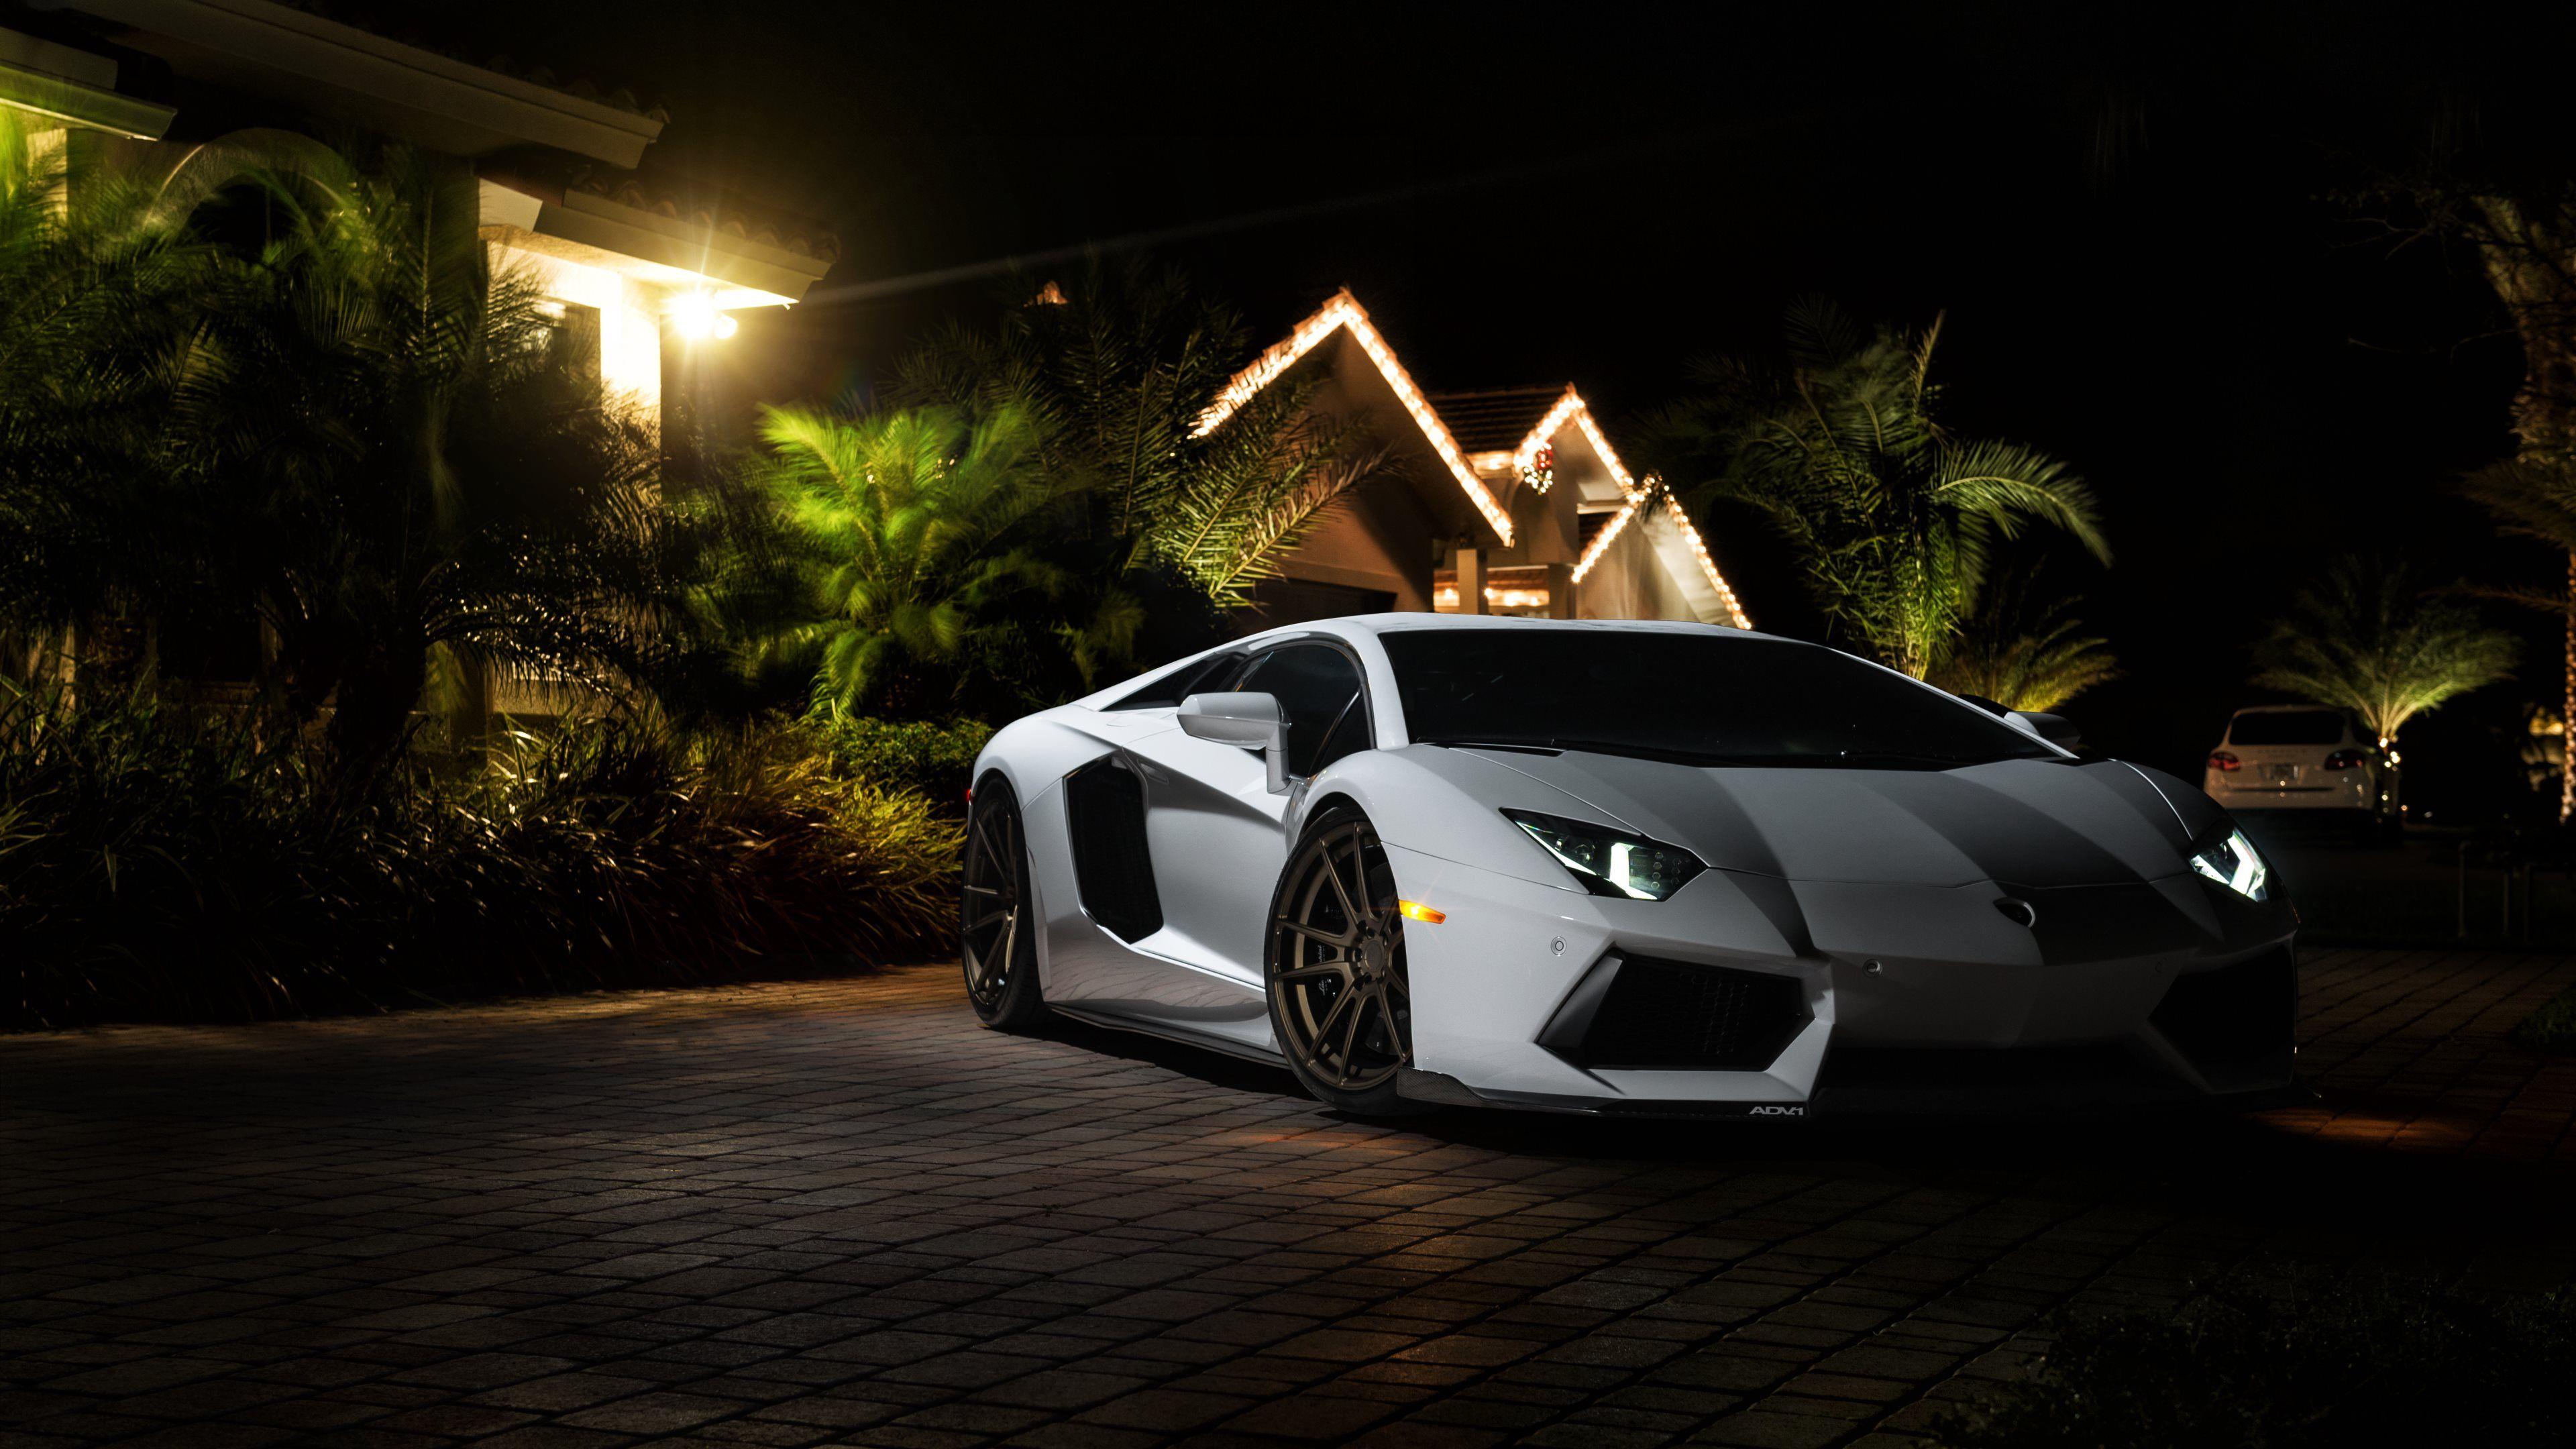 Full Hd P Lamborghini Wallpapers Hd Desktop Backgrounds 4k Ultra